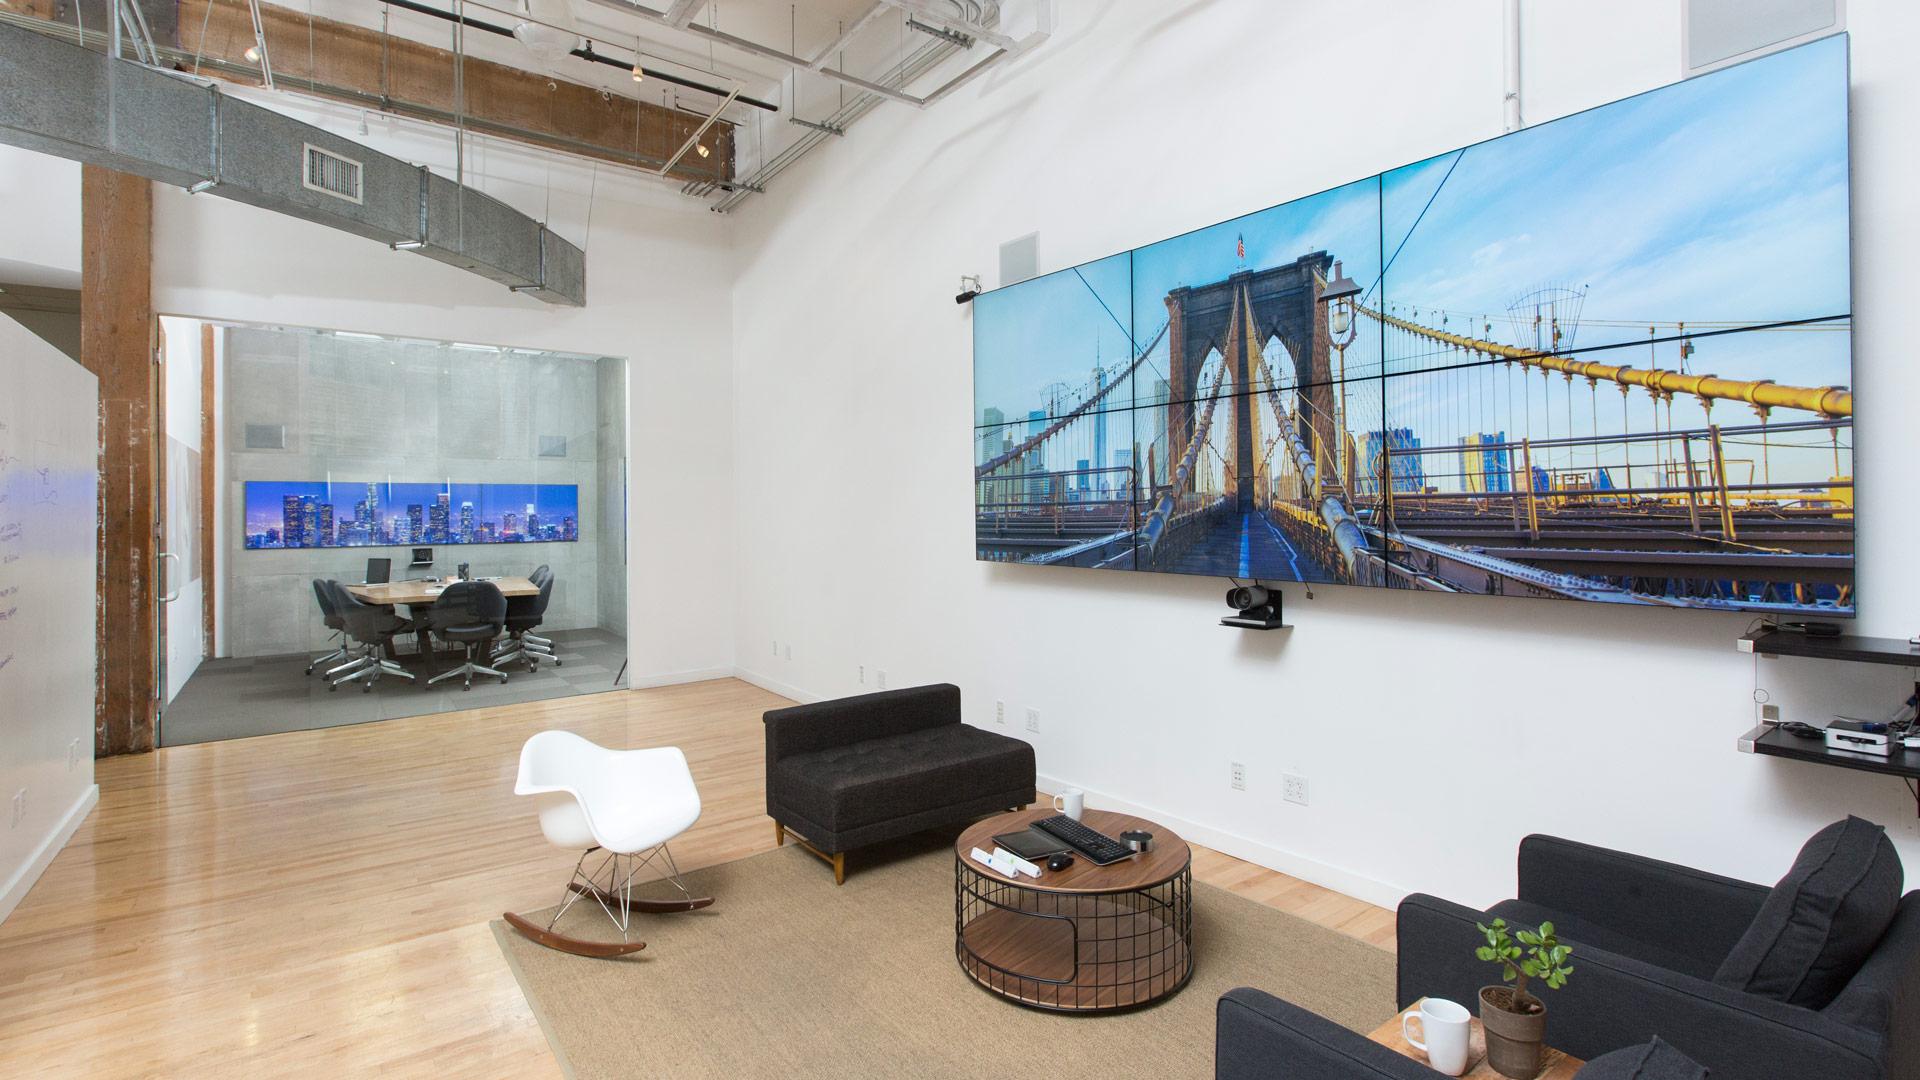 Studio HHH_Oblong Conference Room_3.jpg